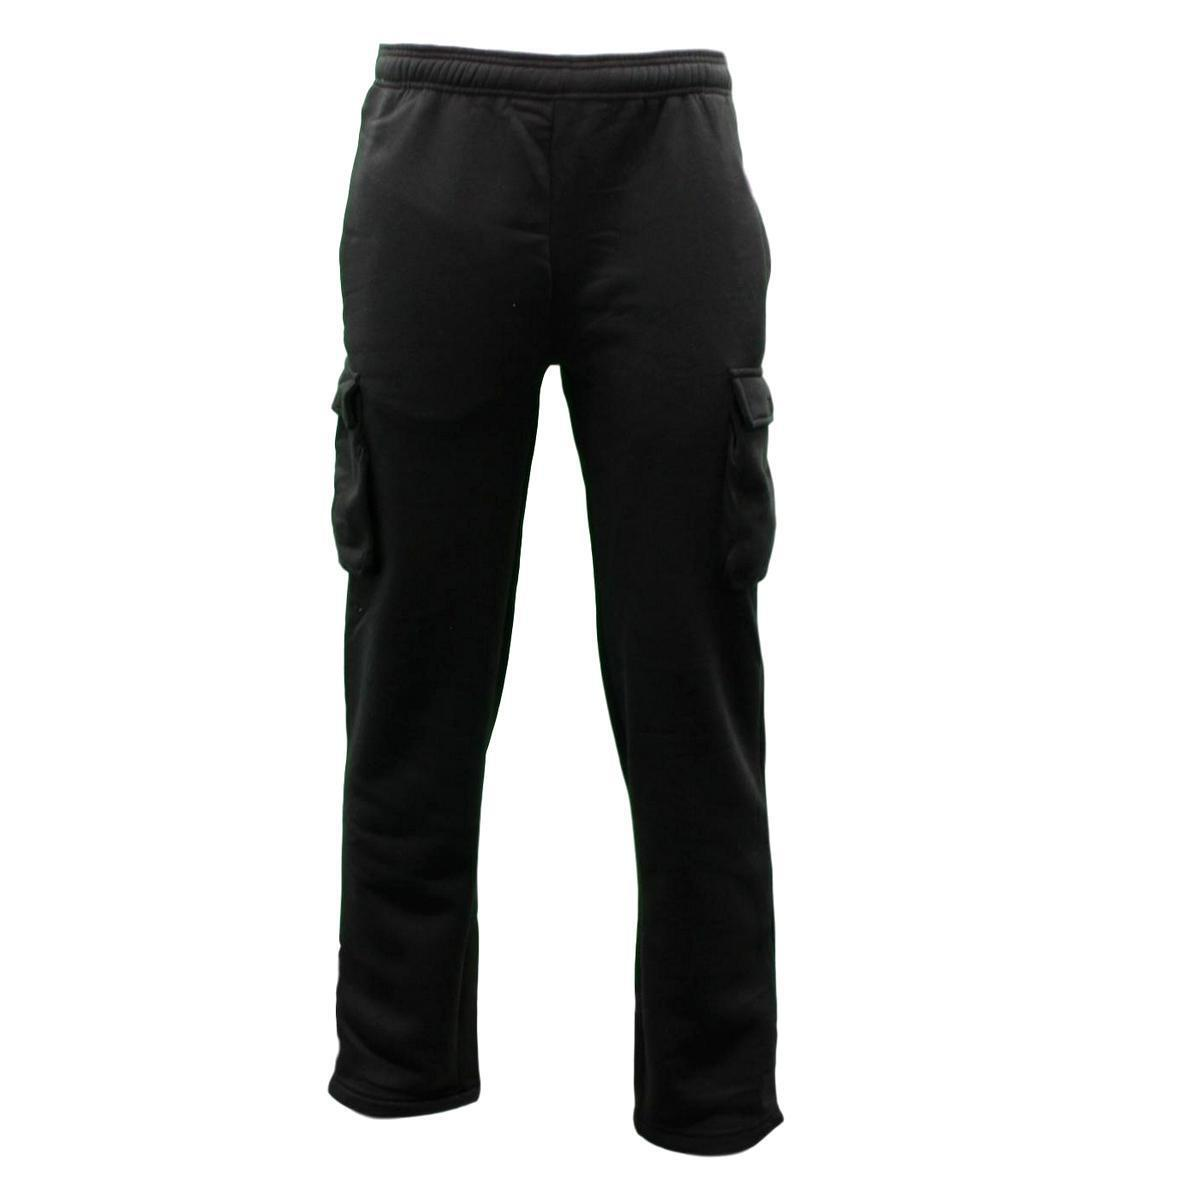 NEW Men/'s Cargo Fleece Casual Jogging Sports Track Suit Pants Trackies